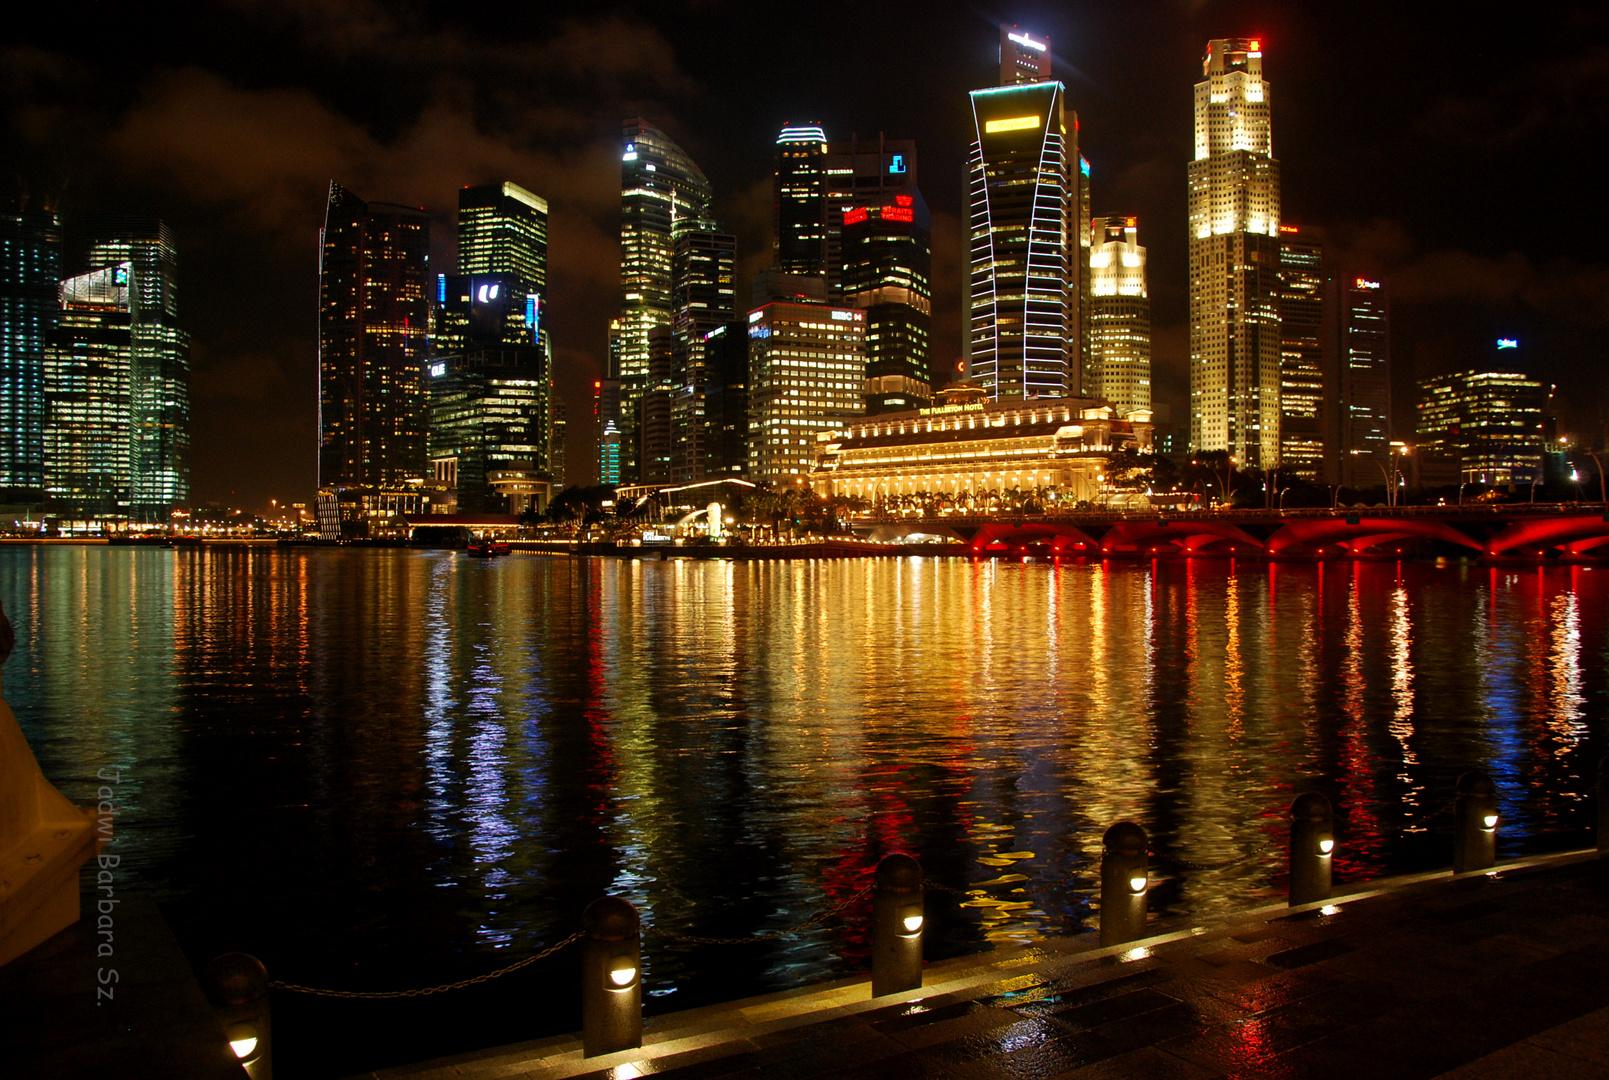 Singapore by night I